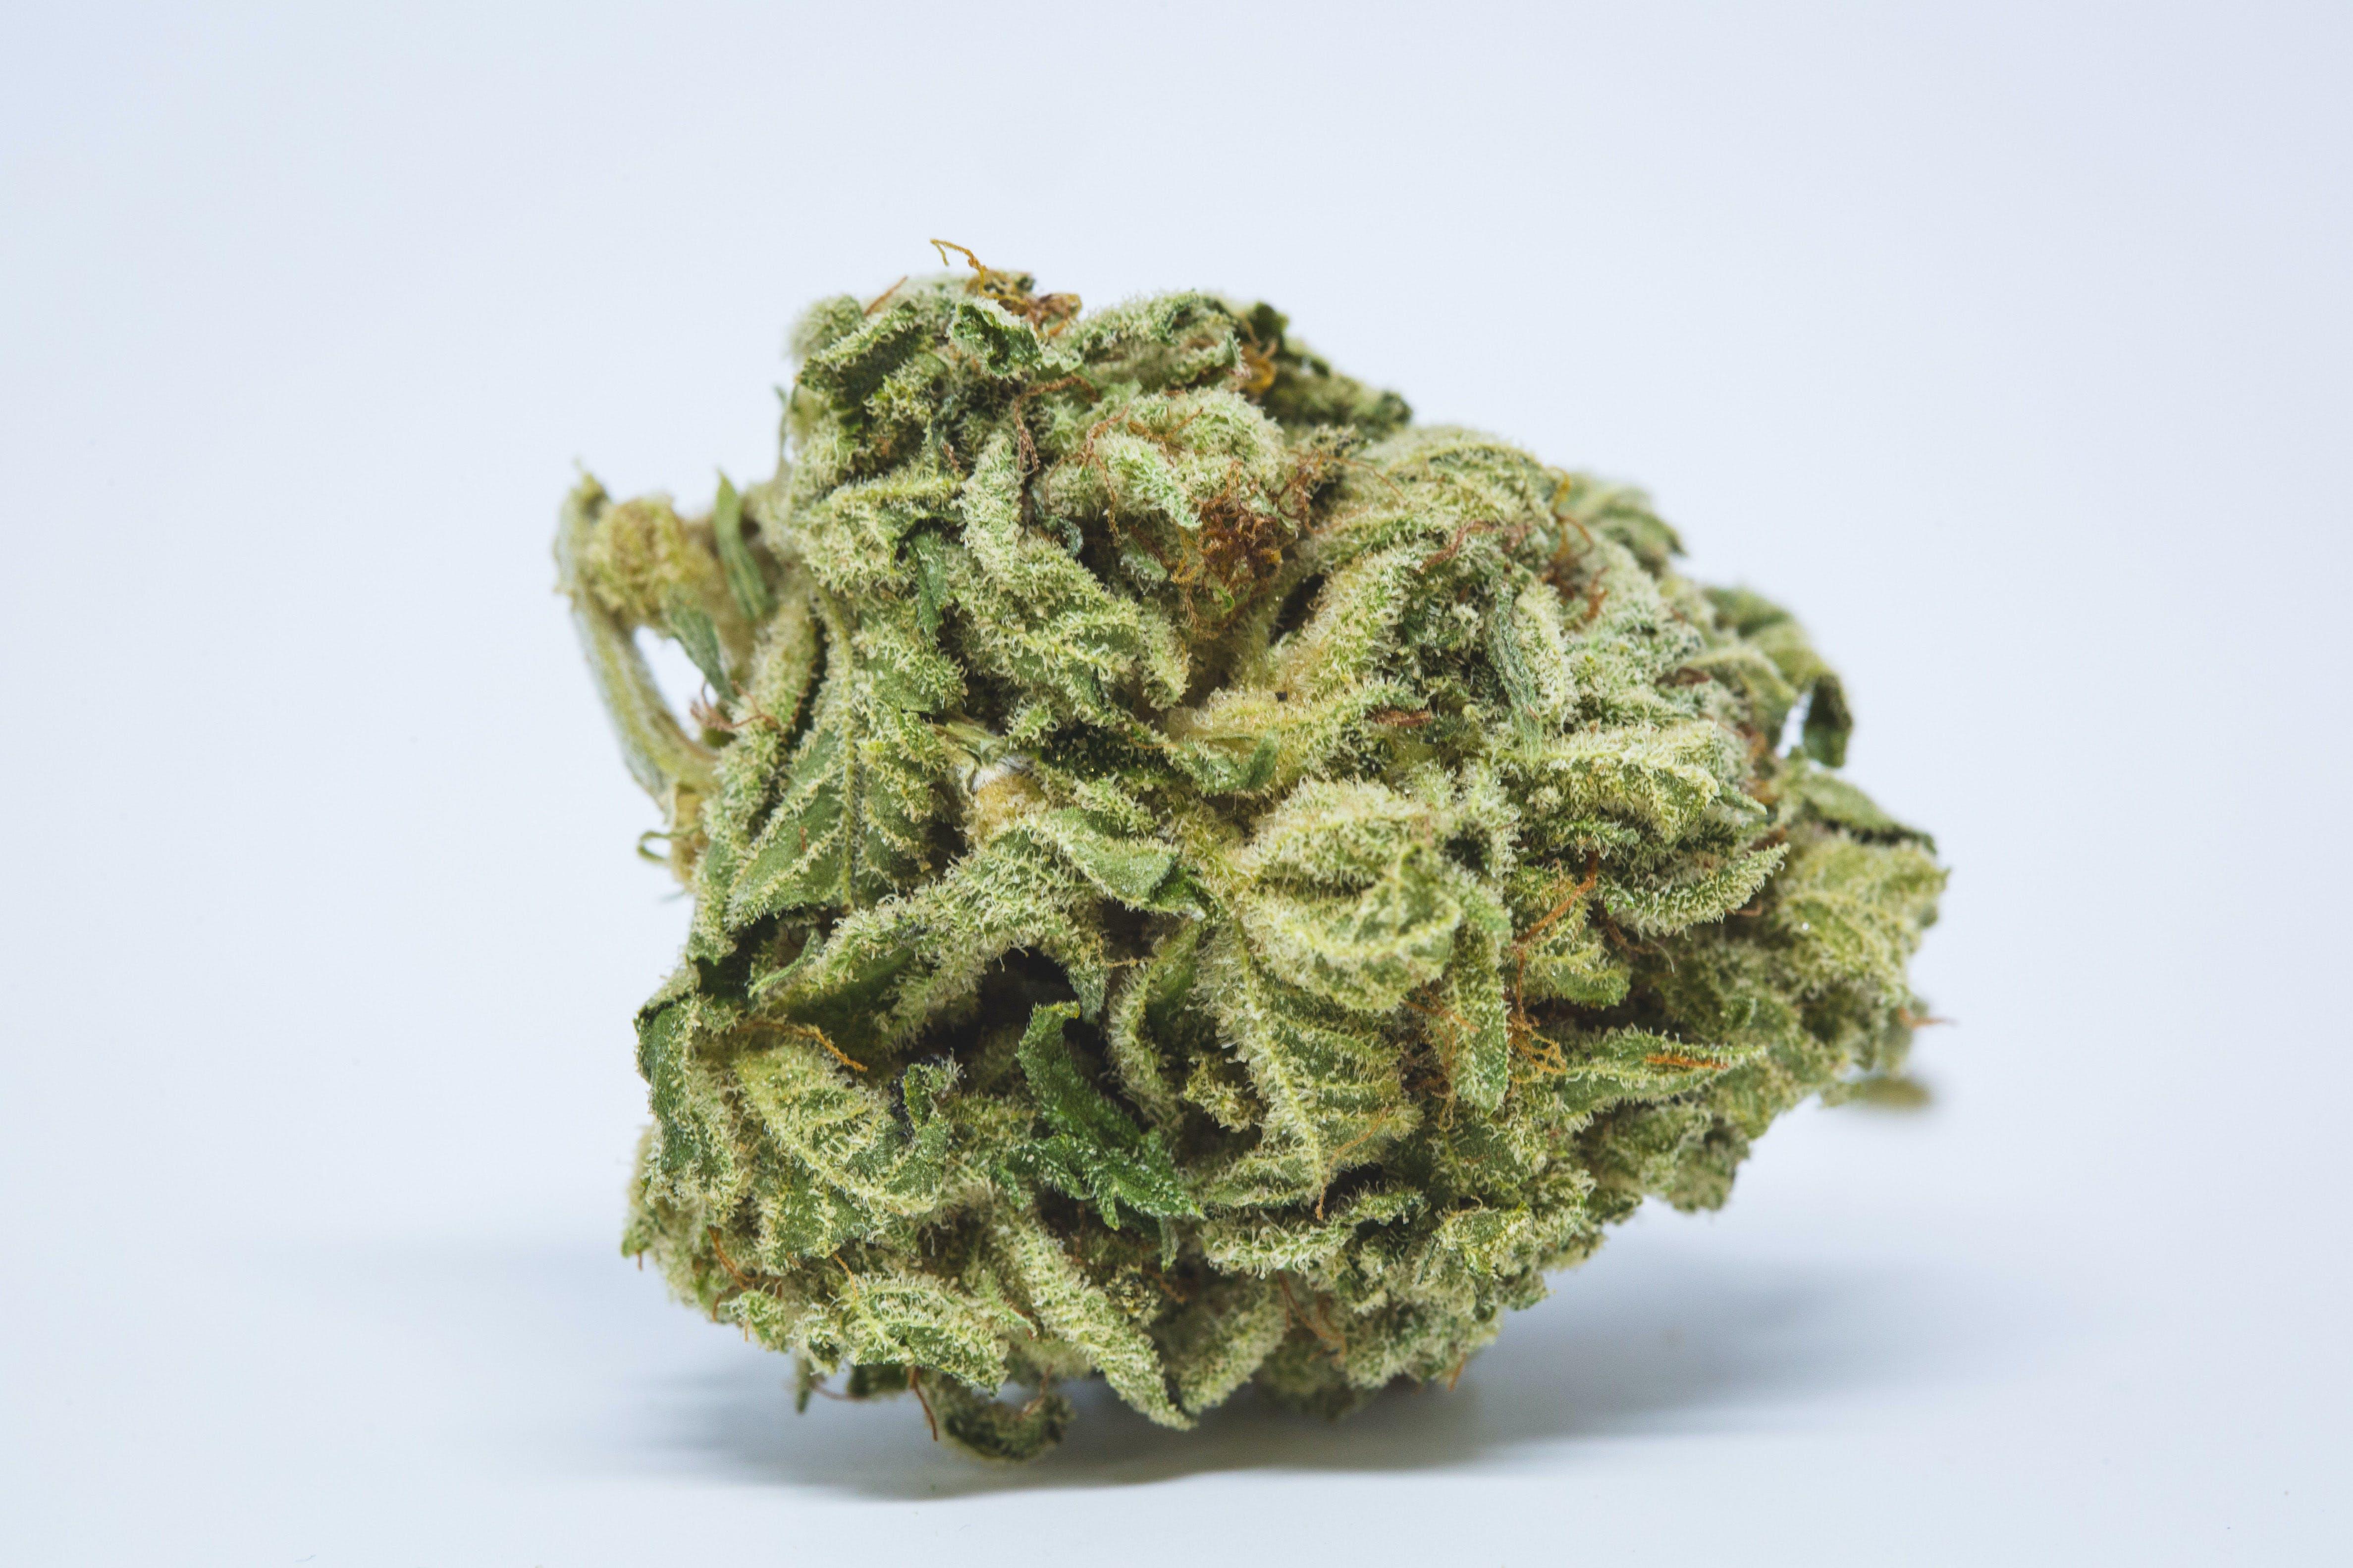 Skywalker OG Weed; Skywalker OG Cannabis Strain; Skywalker OG Hybrid Marijuana Strain